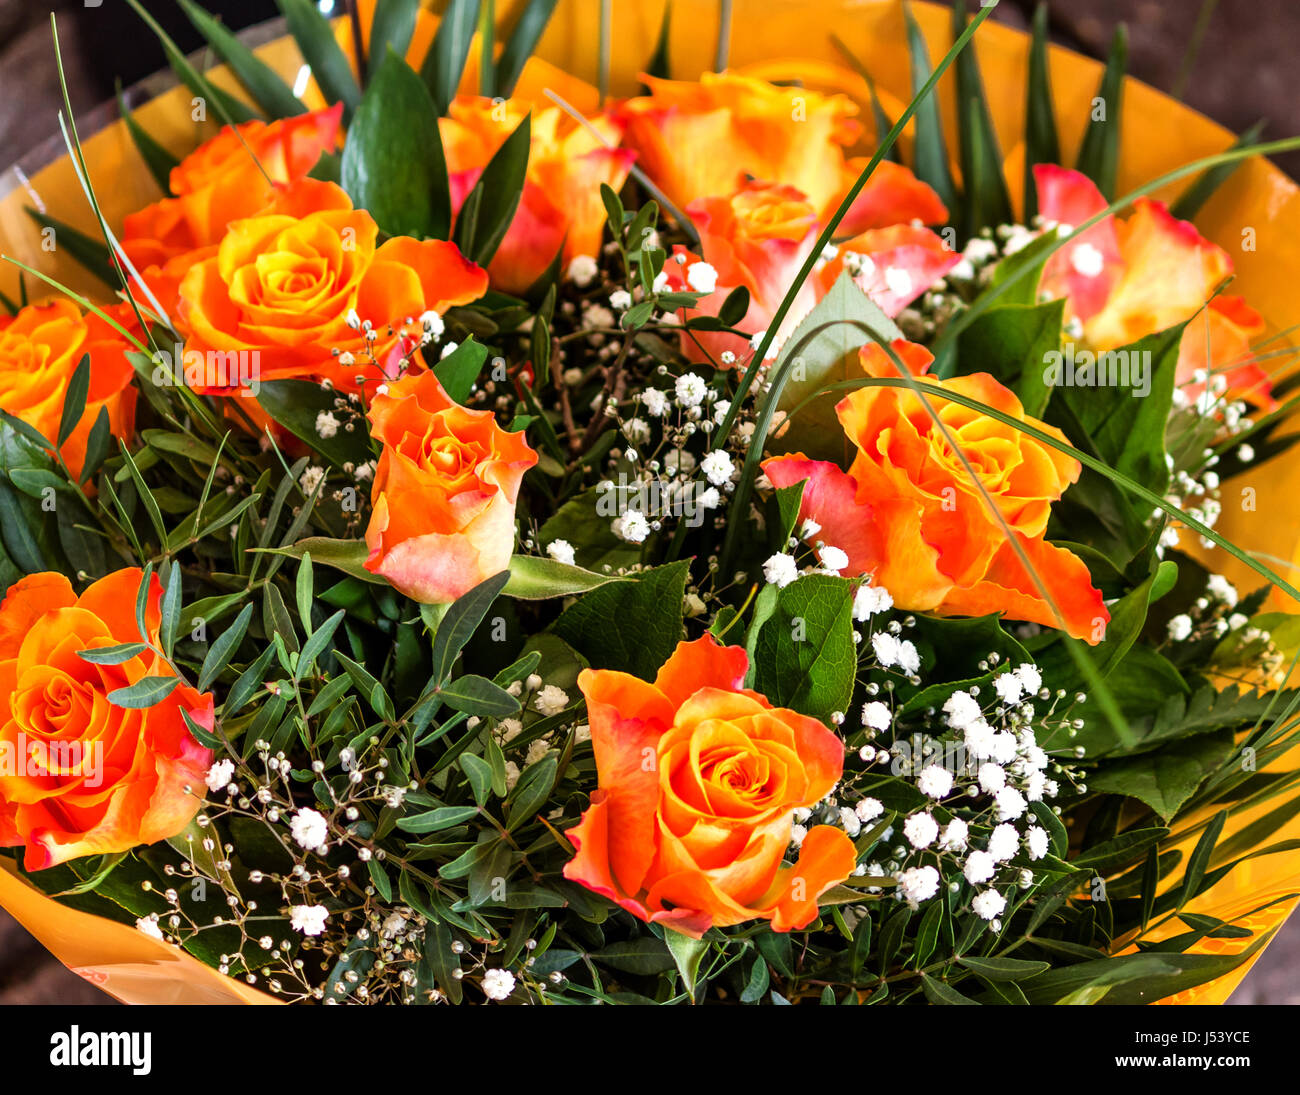 Foto Di Un Bel Mazzo Di Fiori.Mazzo Di Fiori Di Un Bel Colore Arancione Golden Rose Foto